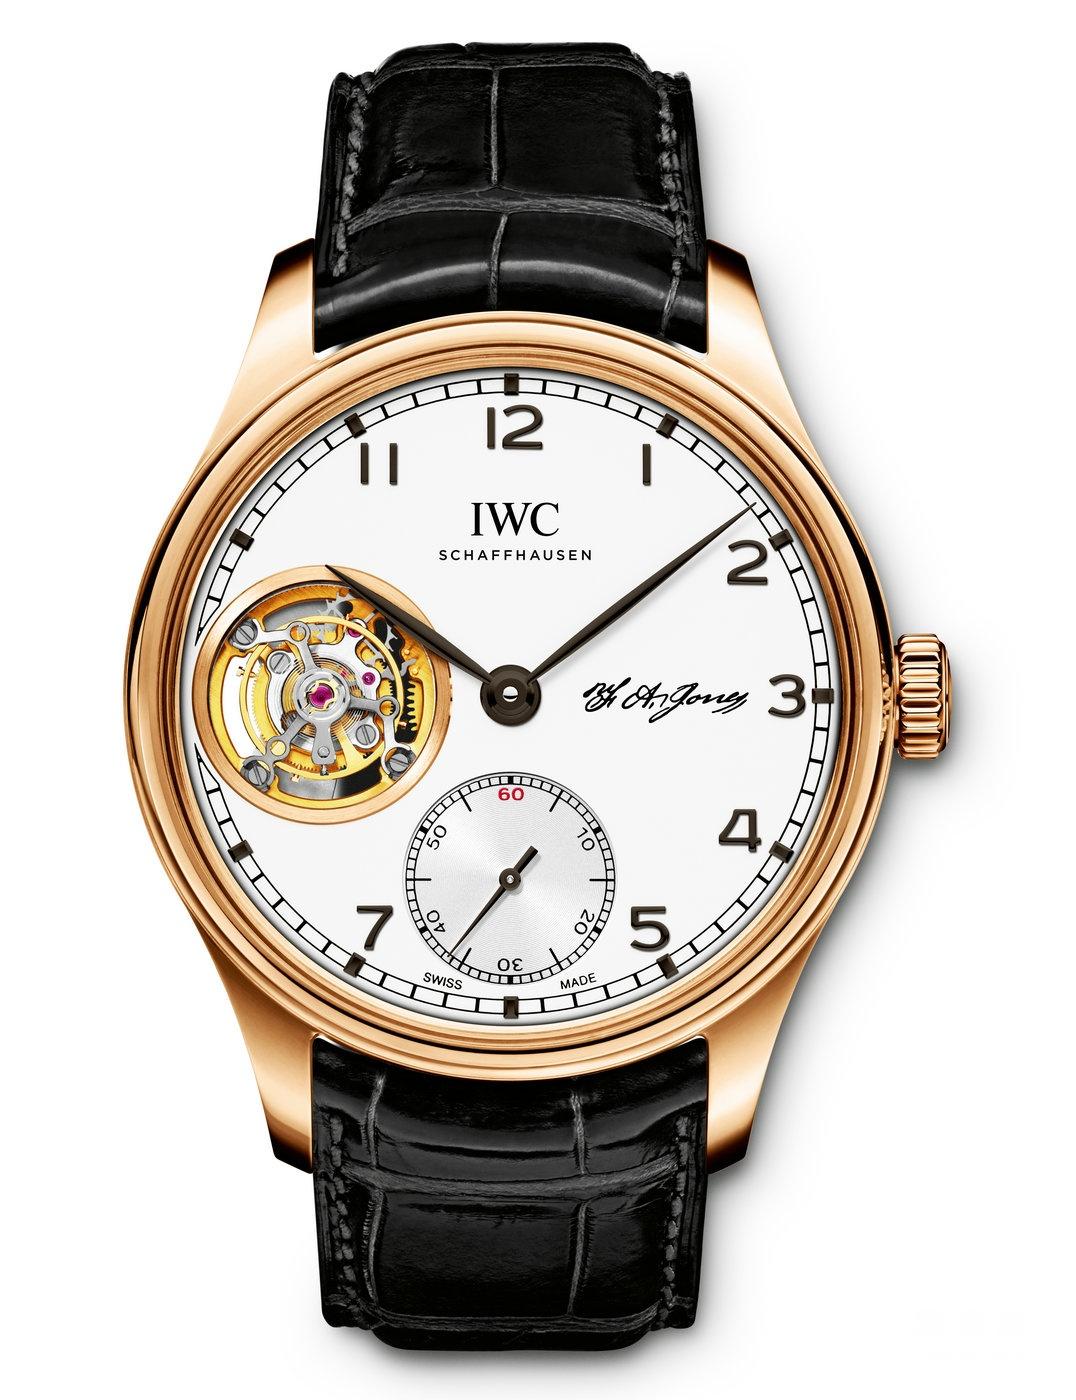 IWC万国表推出葡萄牙系列陀飞轮手动上链特别版腕表 致敬品牌创始人琼斯先生